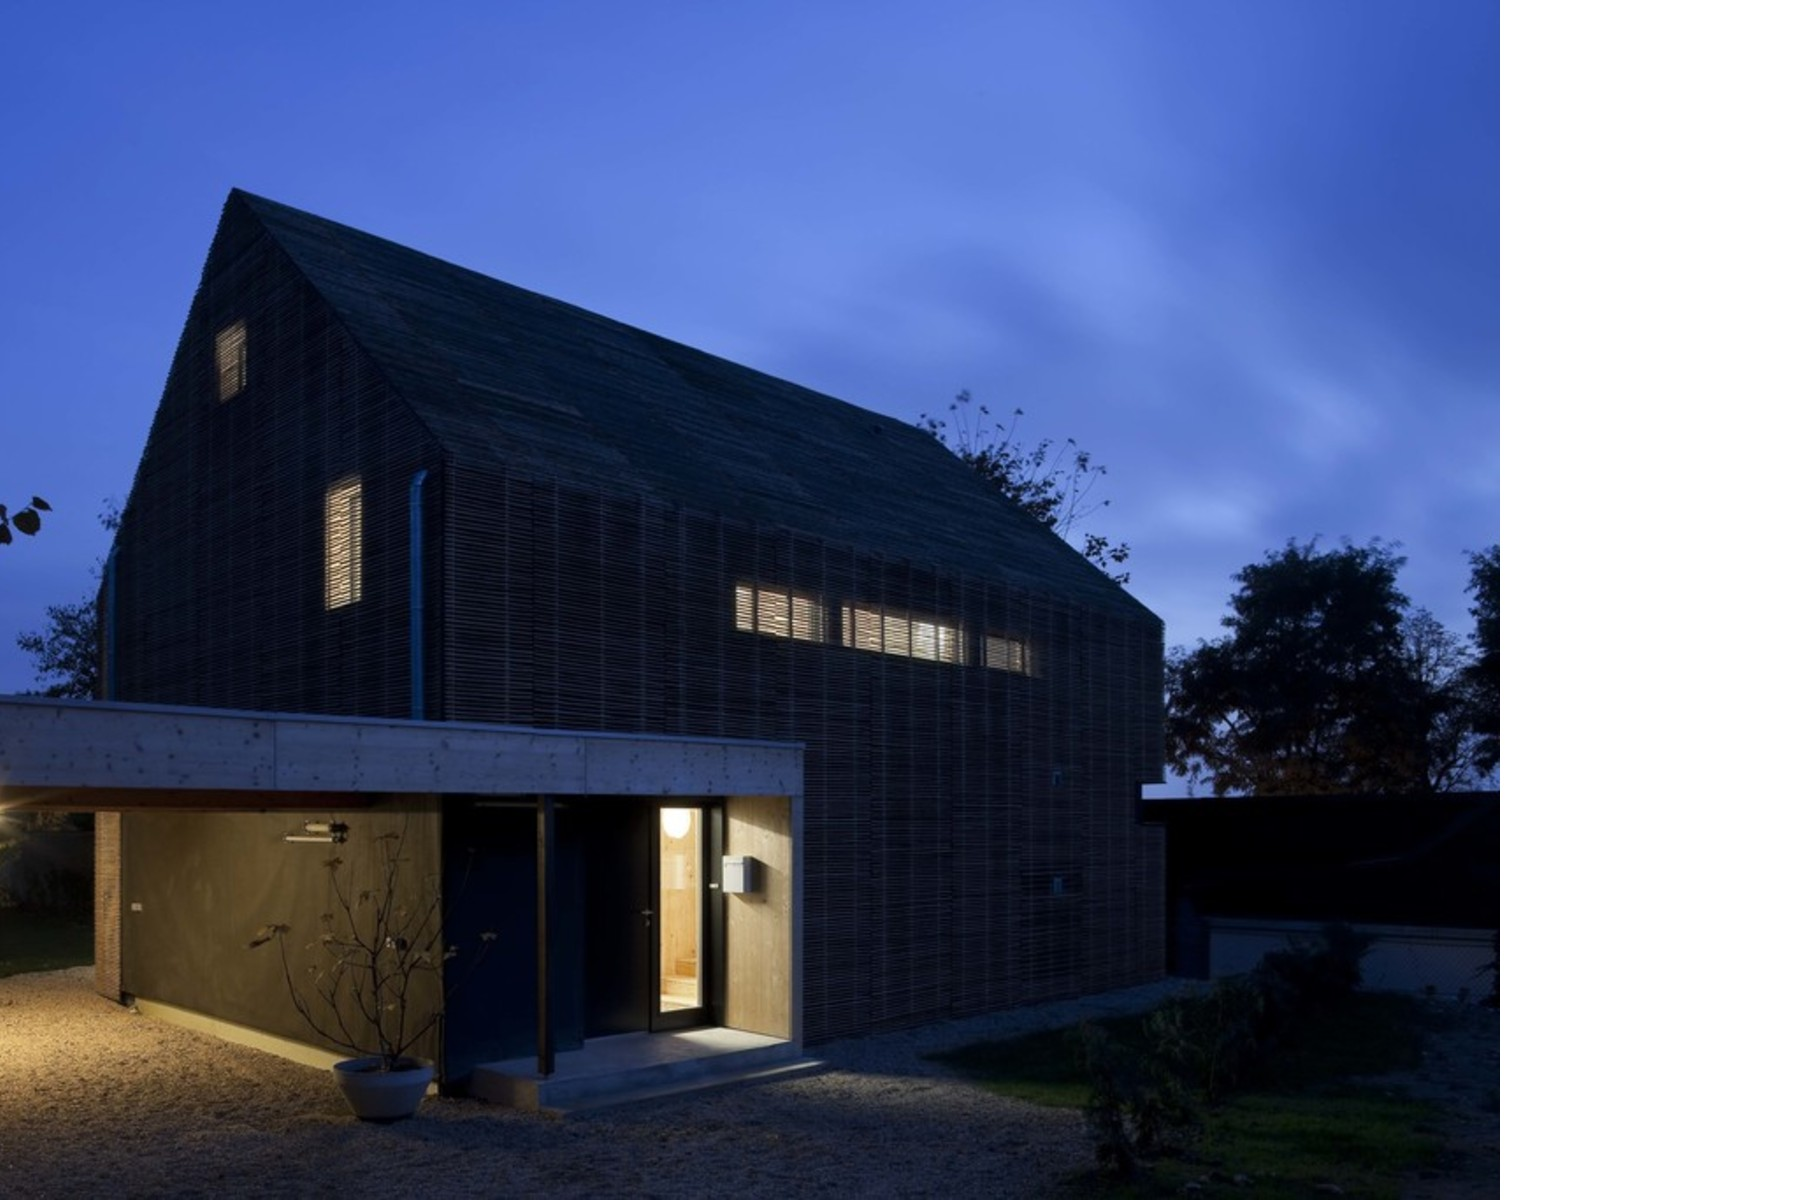 karawitz maison passive en france floornature. Black Bedroom Furniture Sets. Home Design Ideas